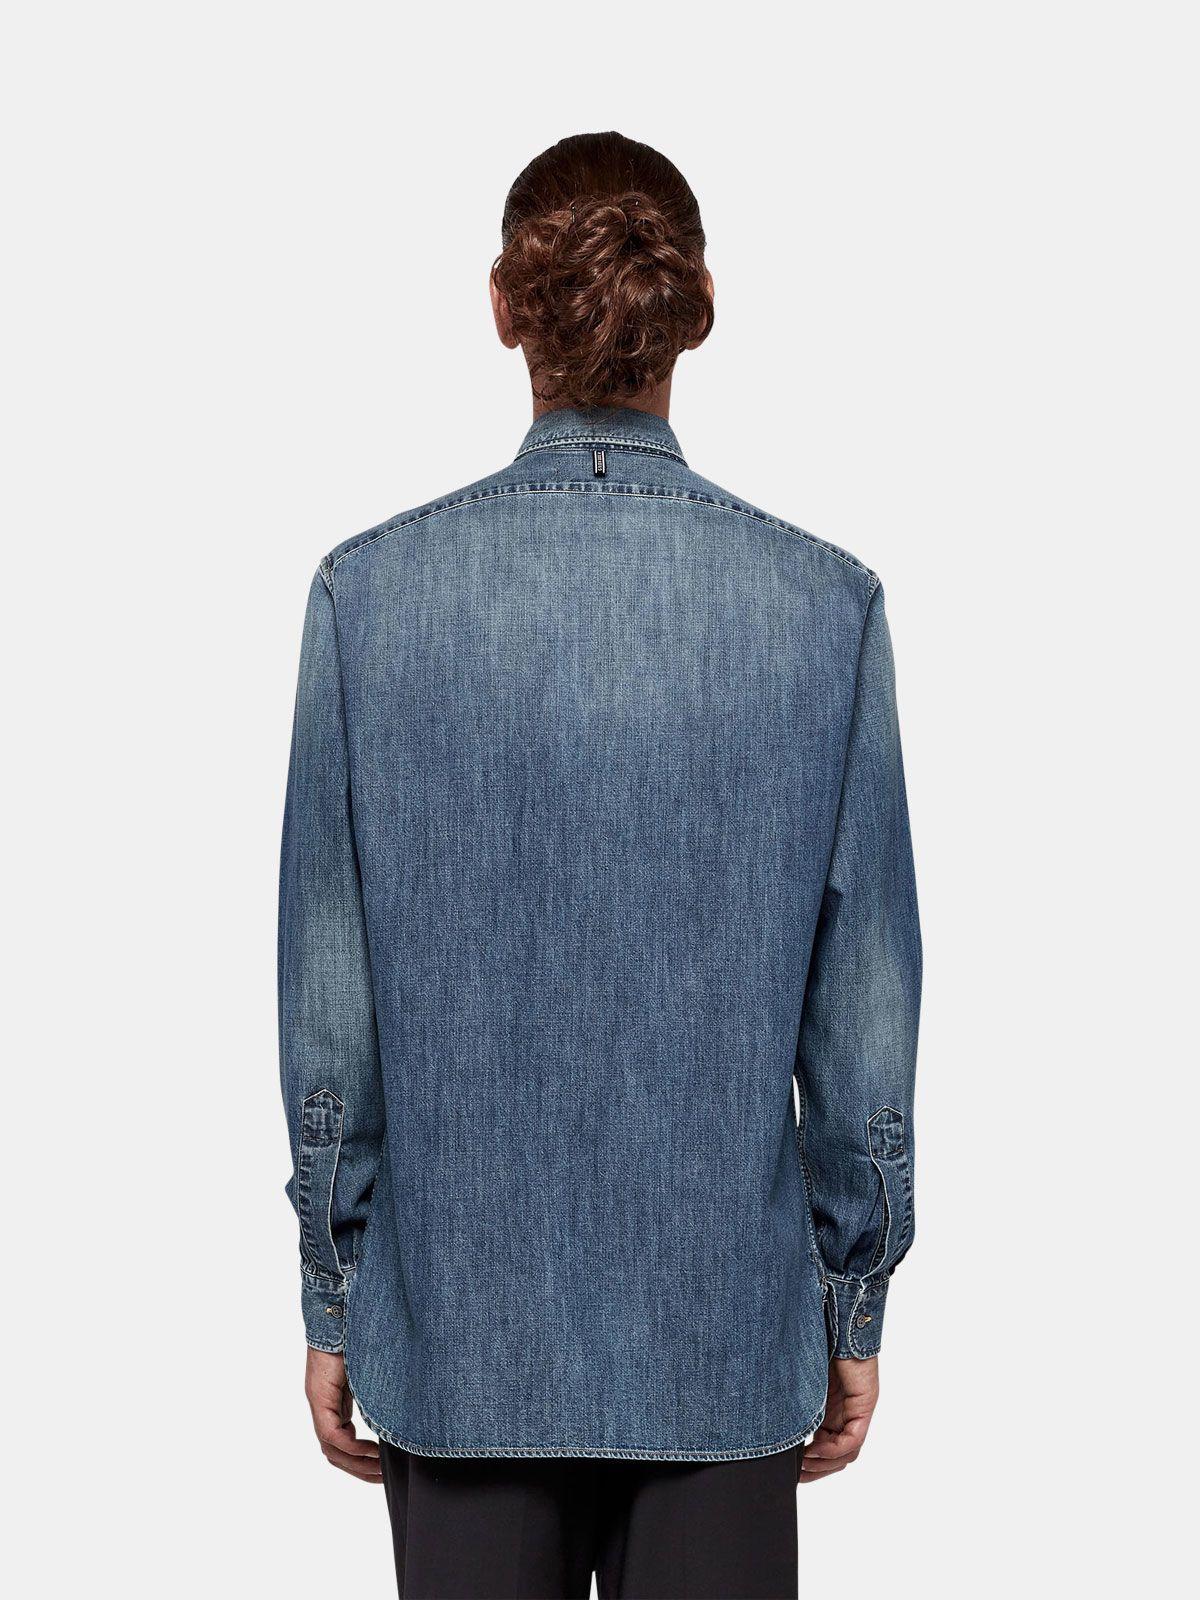 Golden Goose - Kei shirt in cotton denim in